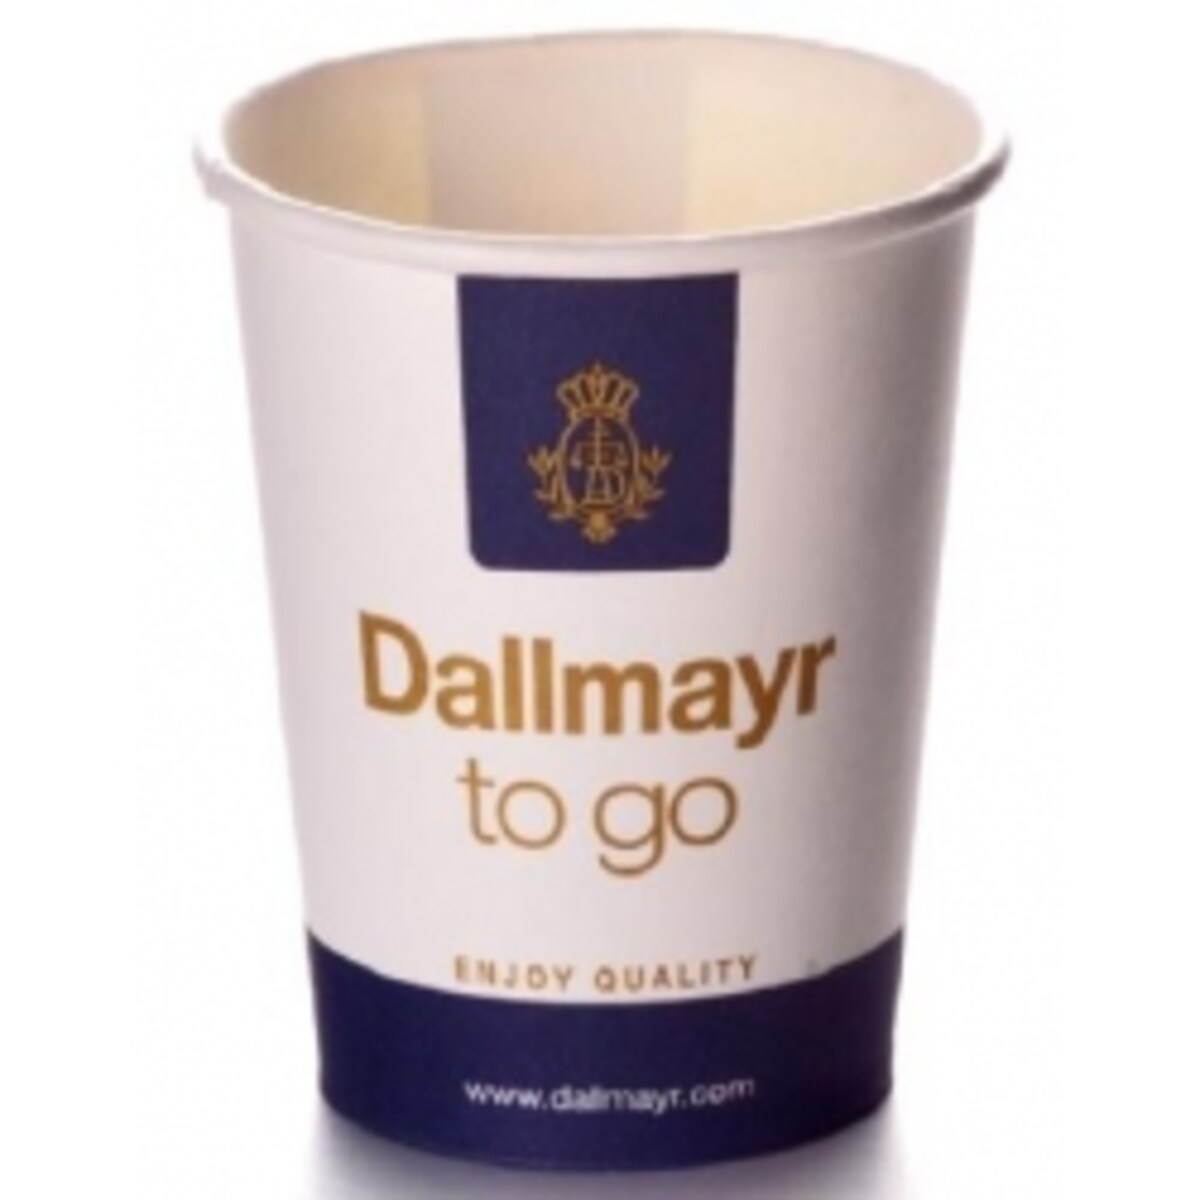 Dallmayr картонени чаши 250 мл, 50 бр. в стек